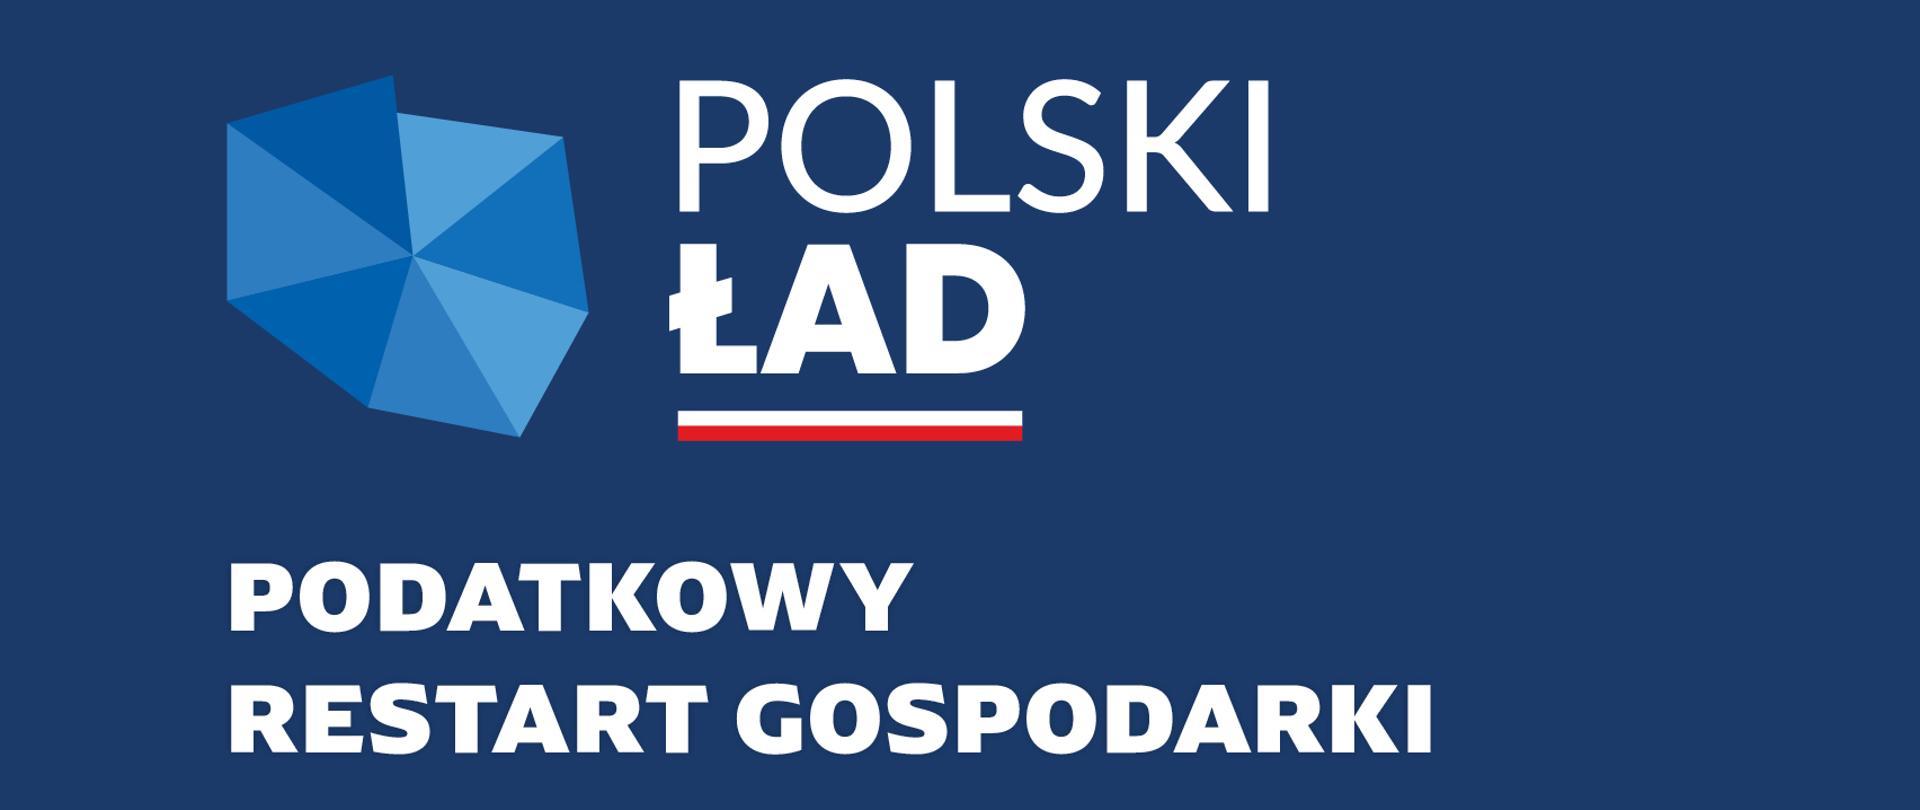 Kontur Polski, napis: Polski Ład. Podatkowy restart gospodarki.